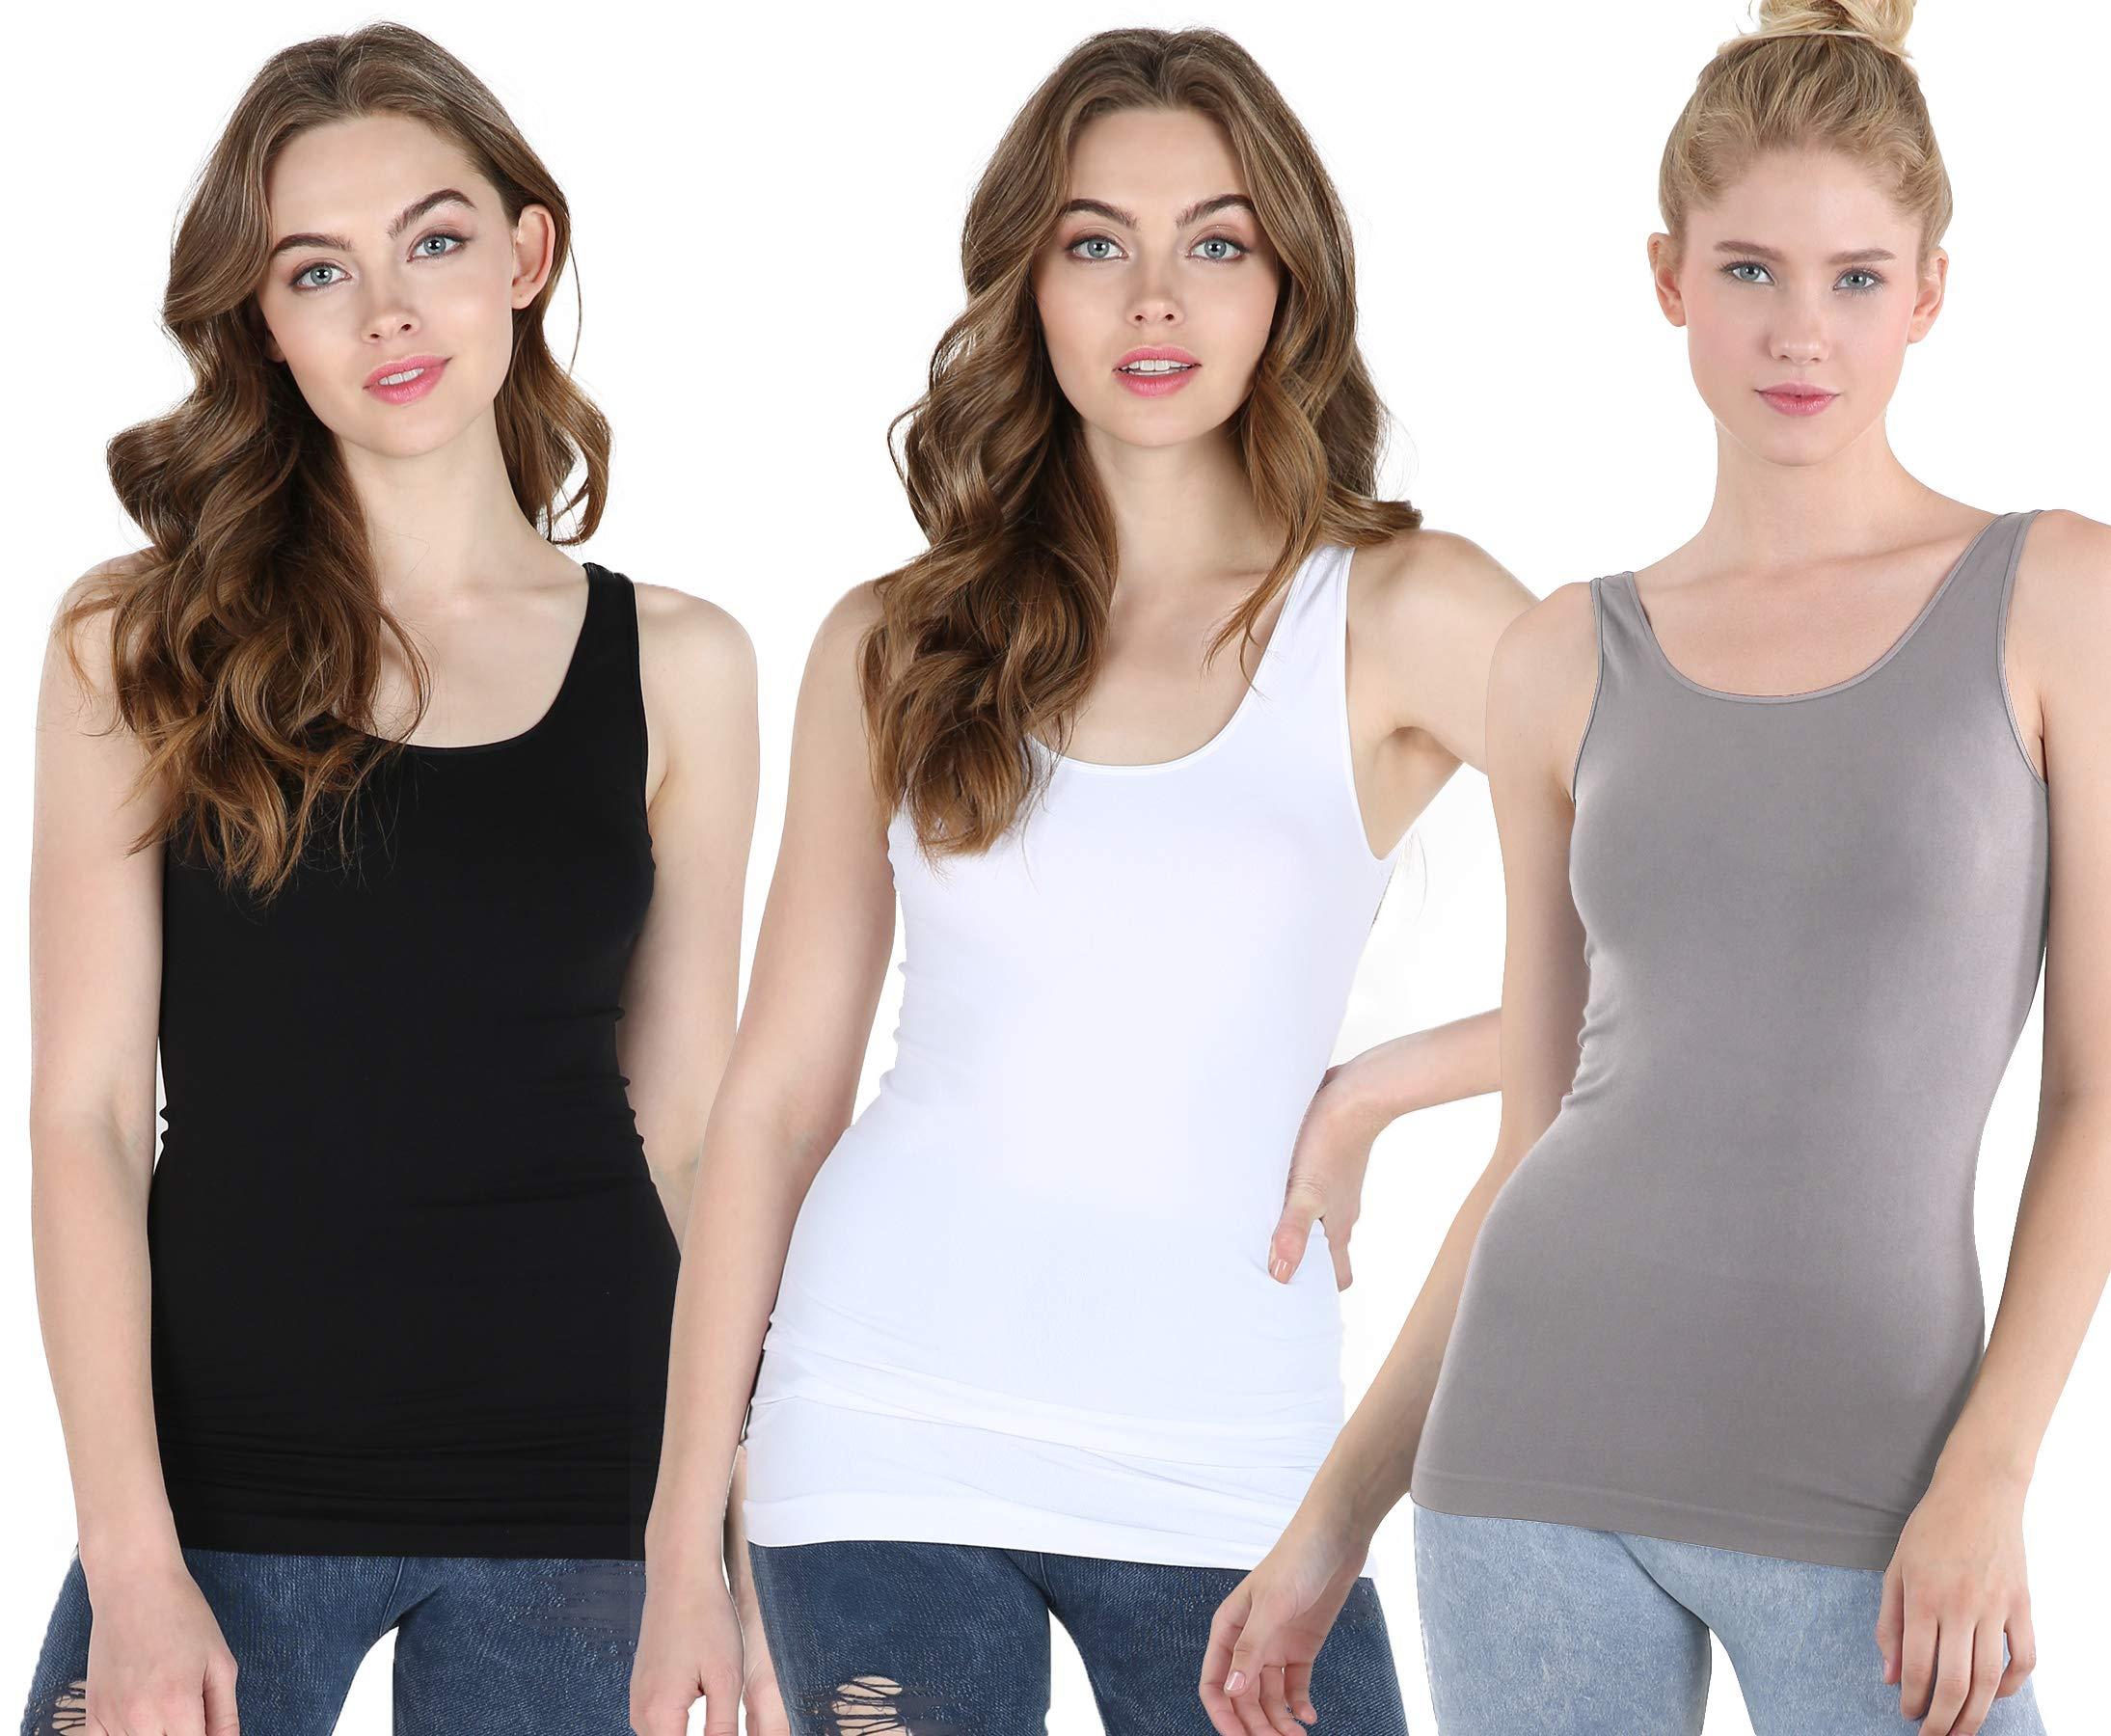 Nikibiki Women's Seamless Premium Classic Tank Top, Made in U.S.A, One Size (Pack of 3: Black, White, Cool Grey)